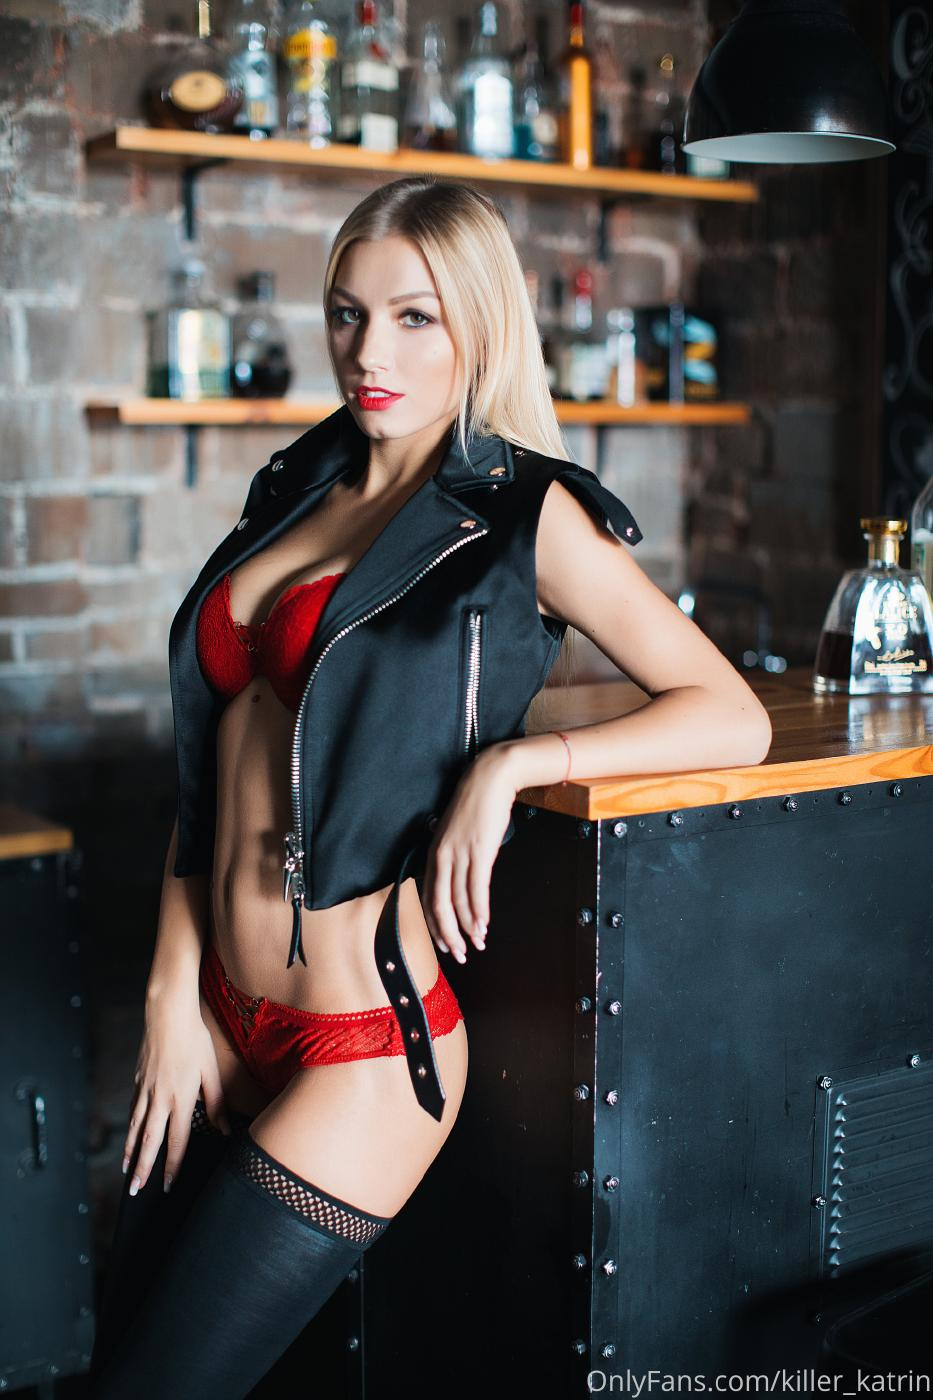 Killer Katrin Bar Striptease Onlyfans Set Leaked 0001